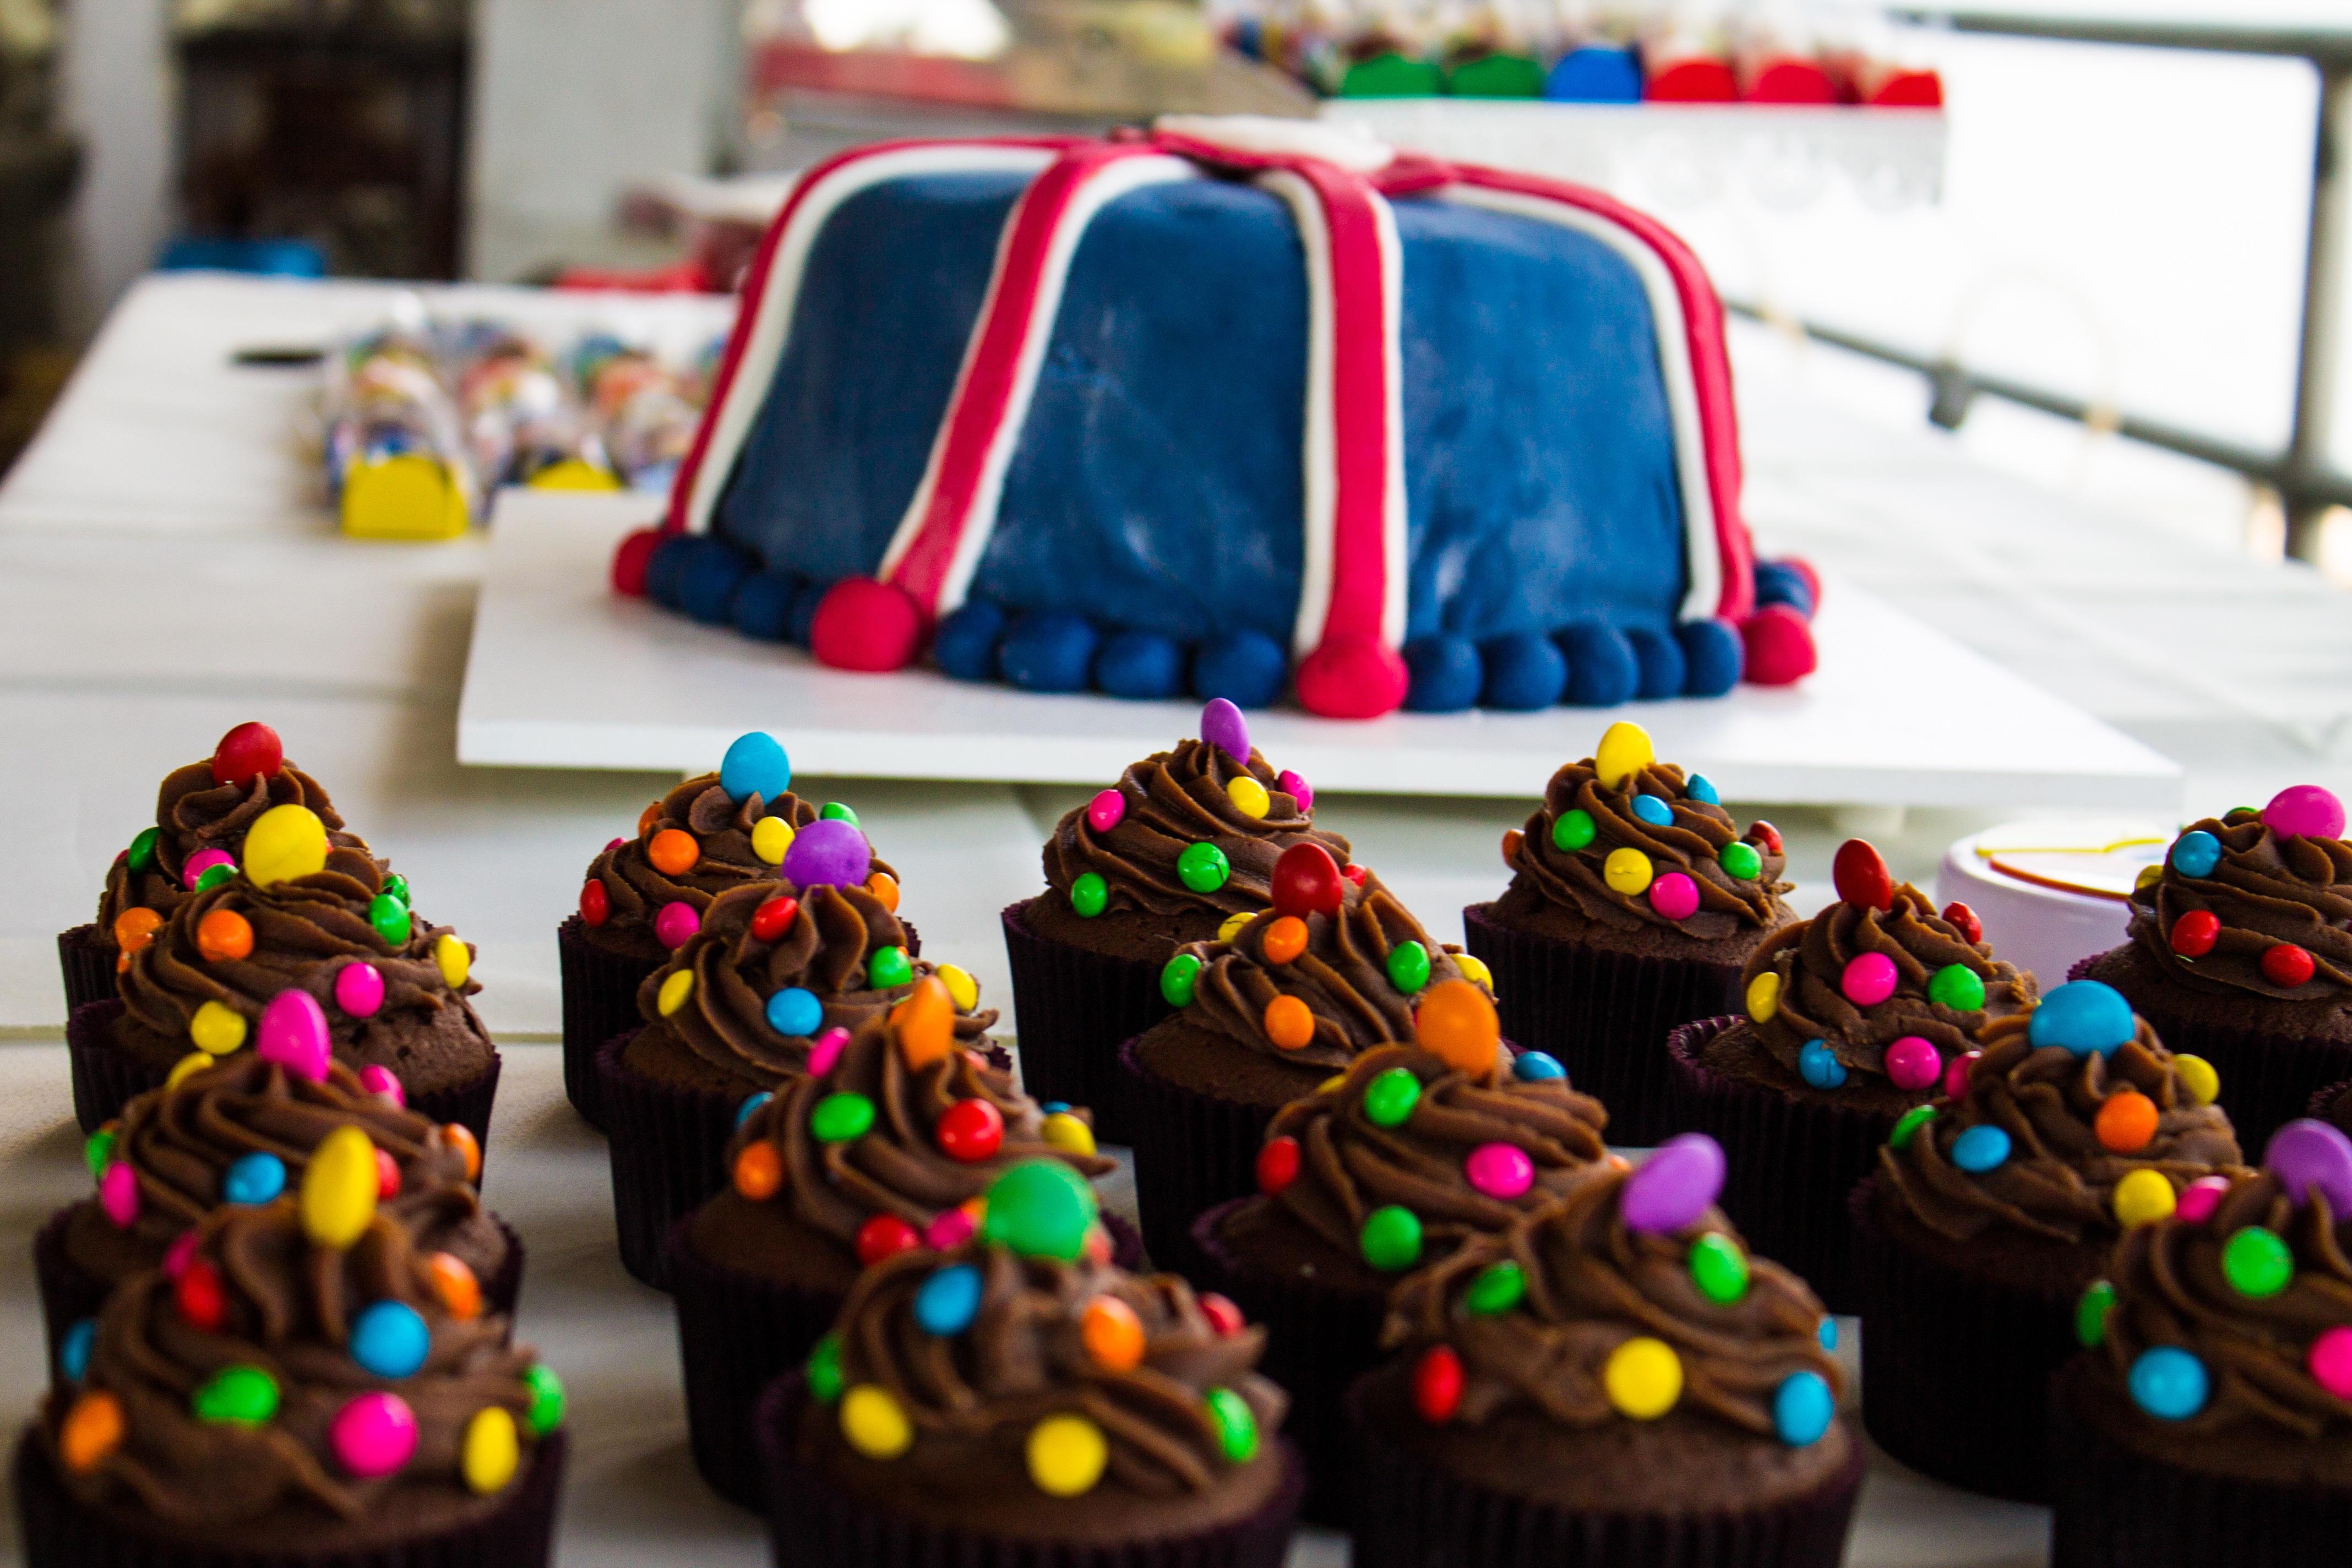 dulce comida color magdalena postre pastel formacin de hielo fiesta cumpleaos golosinas decoracin de pasteles